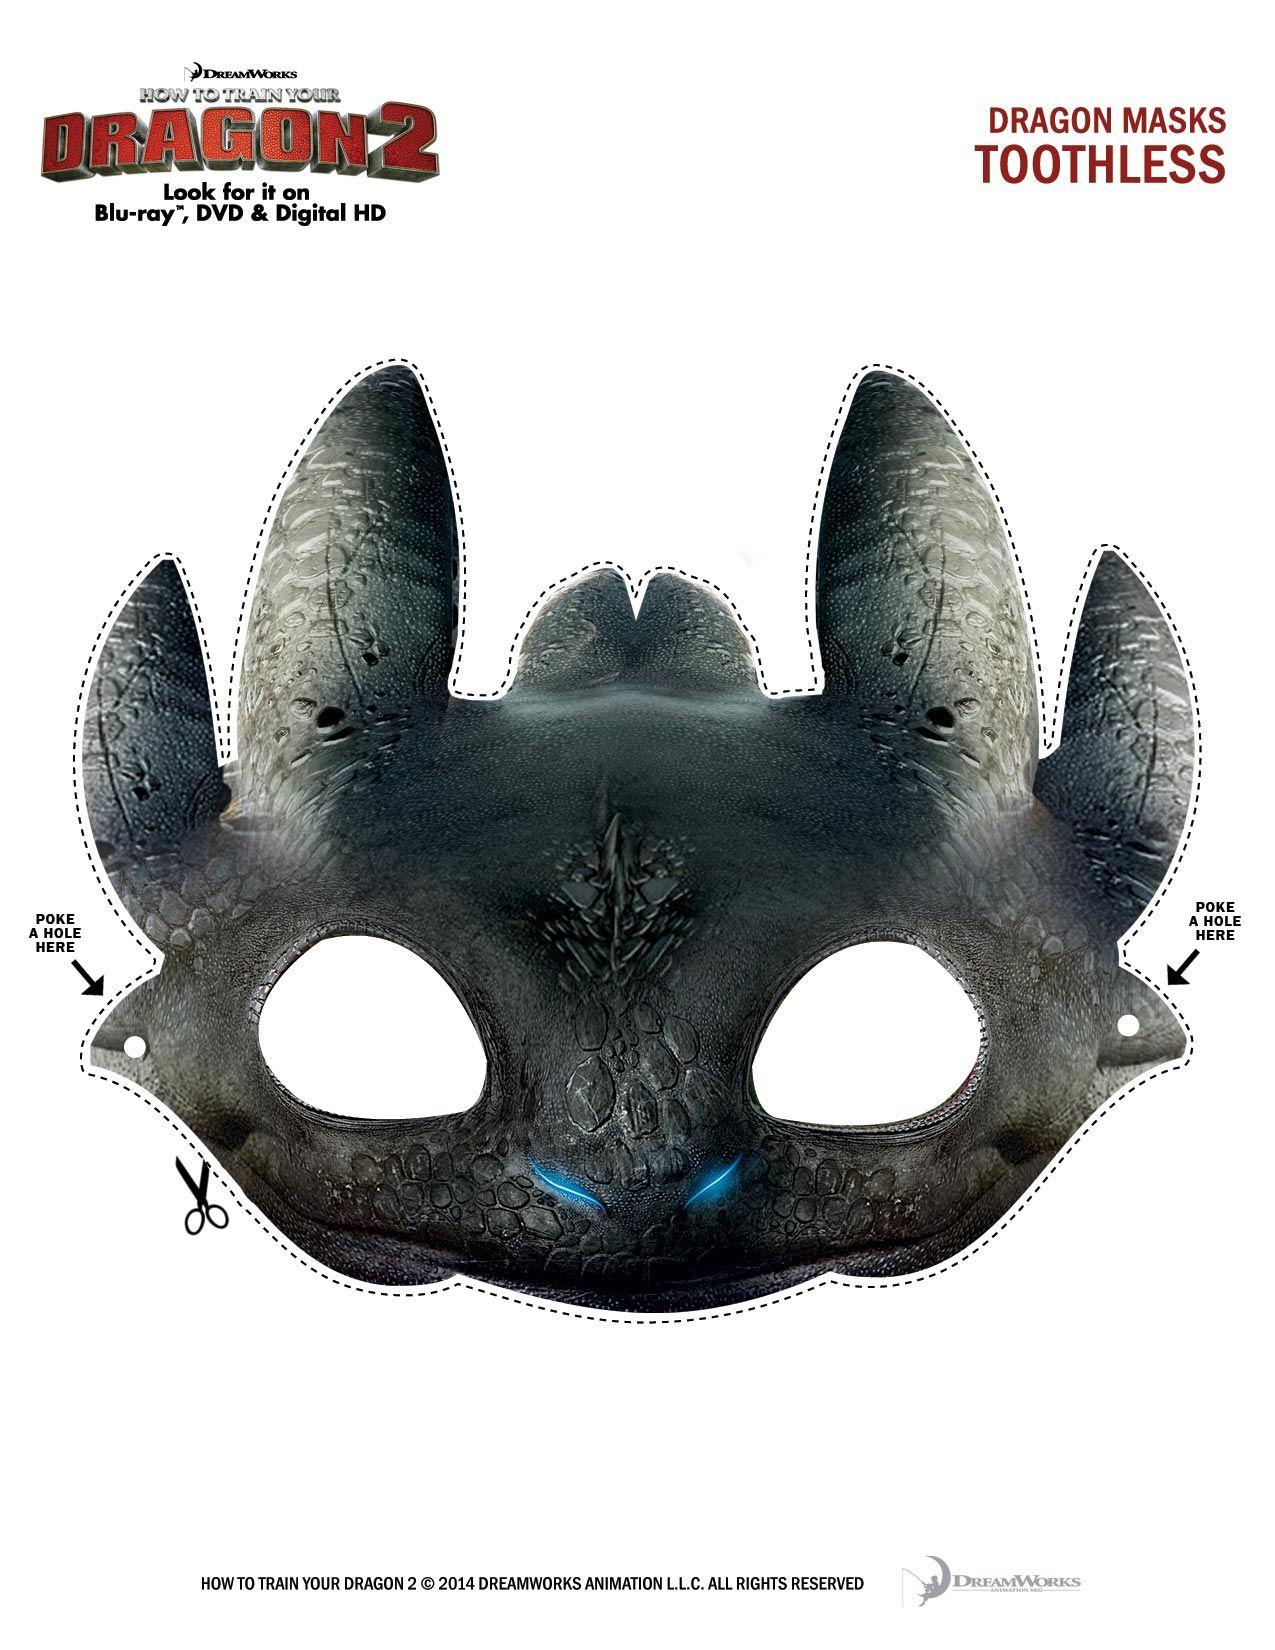 10+ images about masks on Pinterest | Masks, Mask for kids and ...